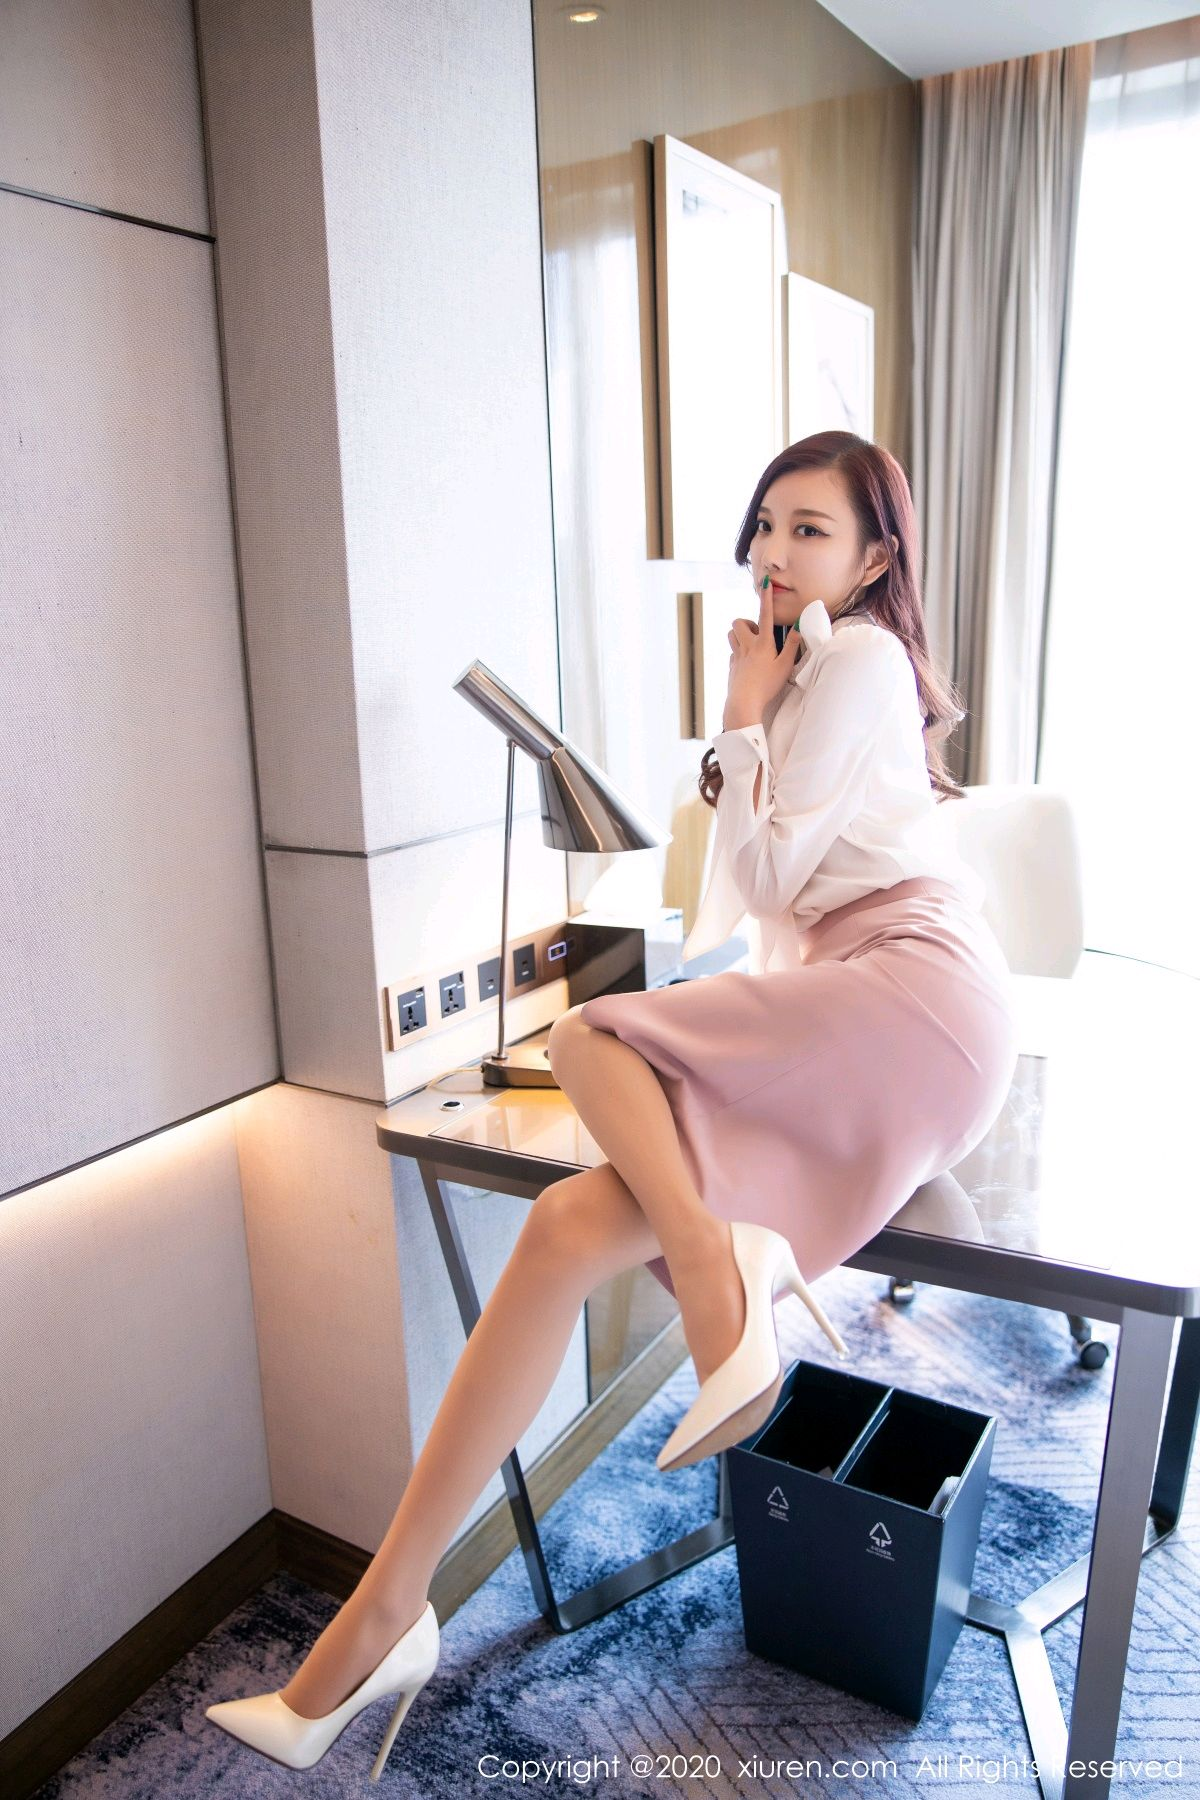 [XiuRen] Vol.2431 Yang Chen Chen 19P, Tall, Underwear, Uniform, Xiuren, Yang Chen Chen